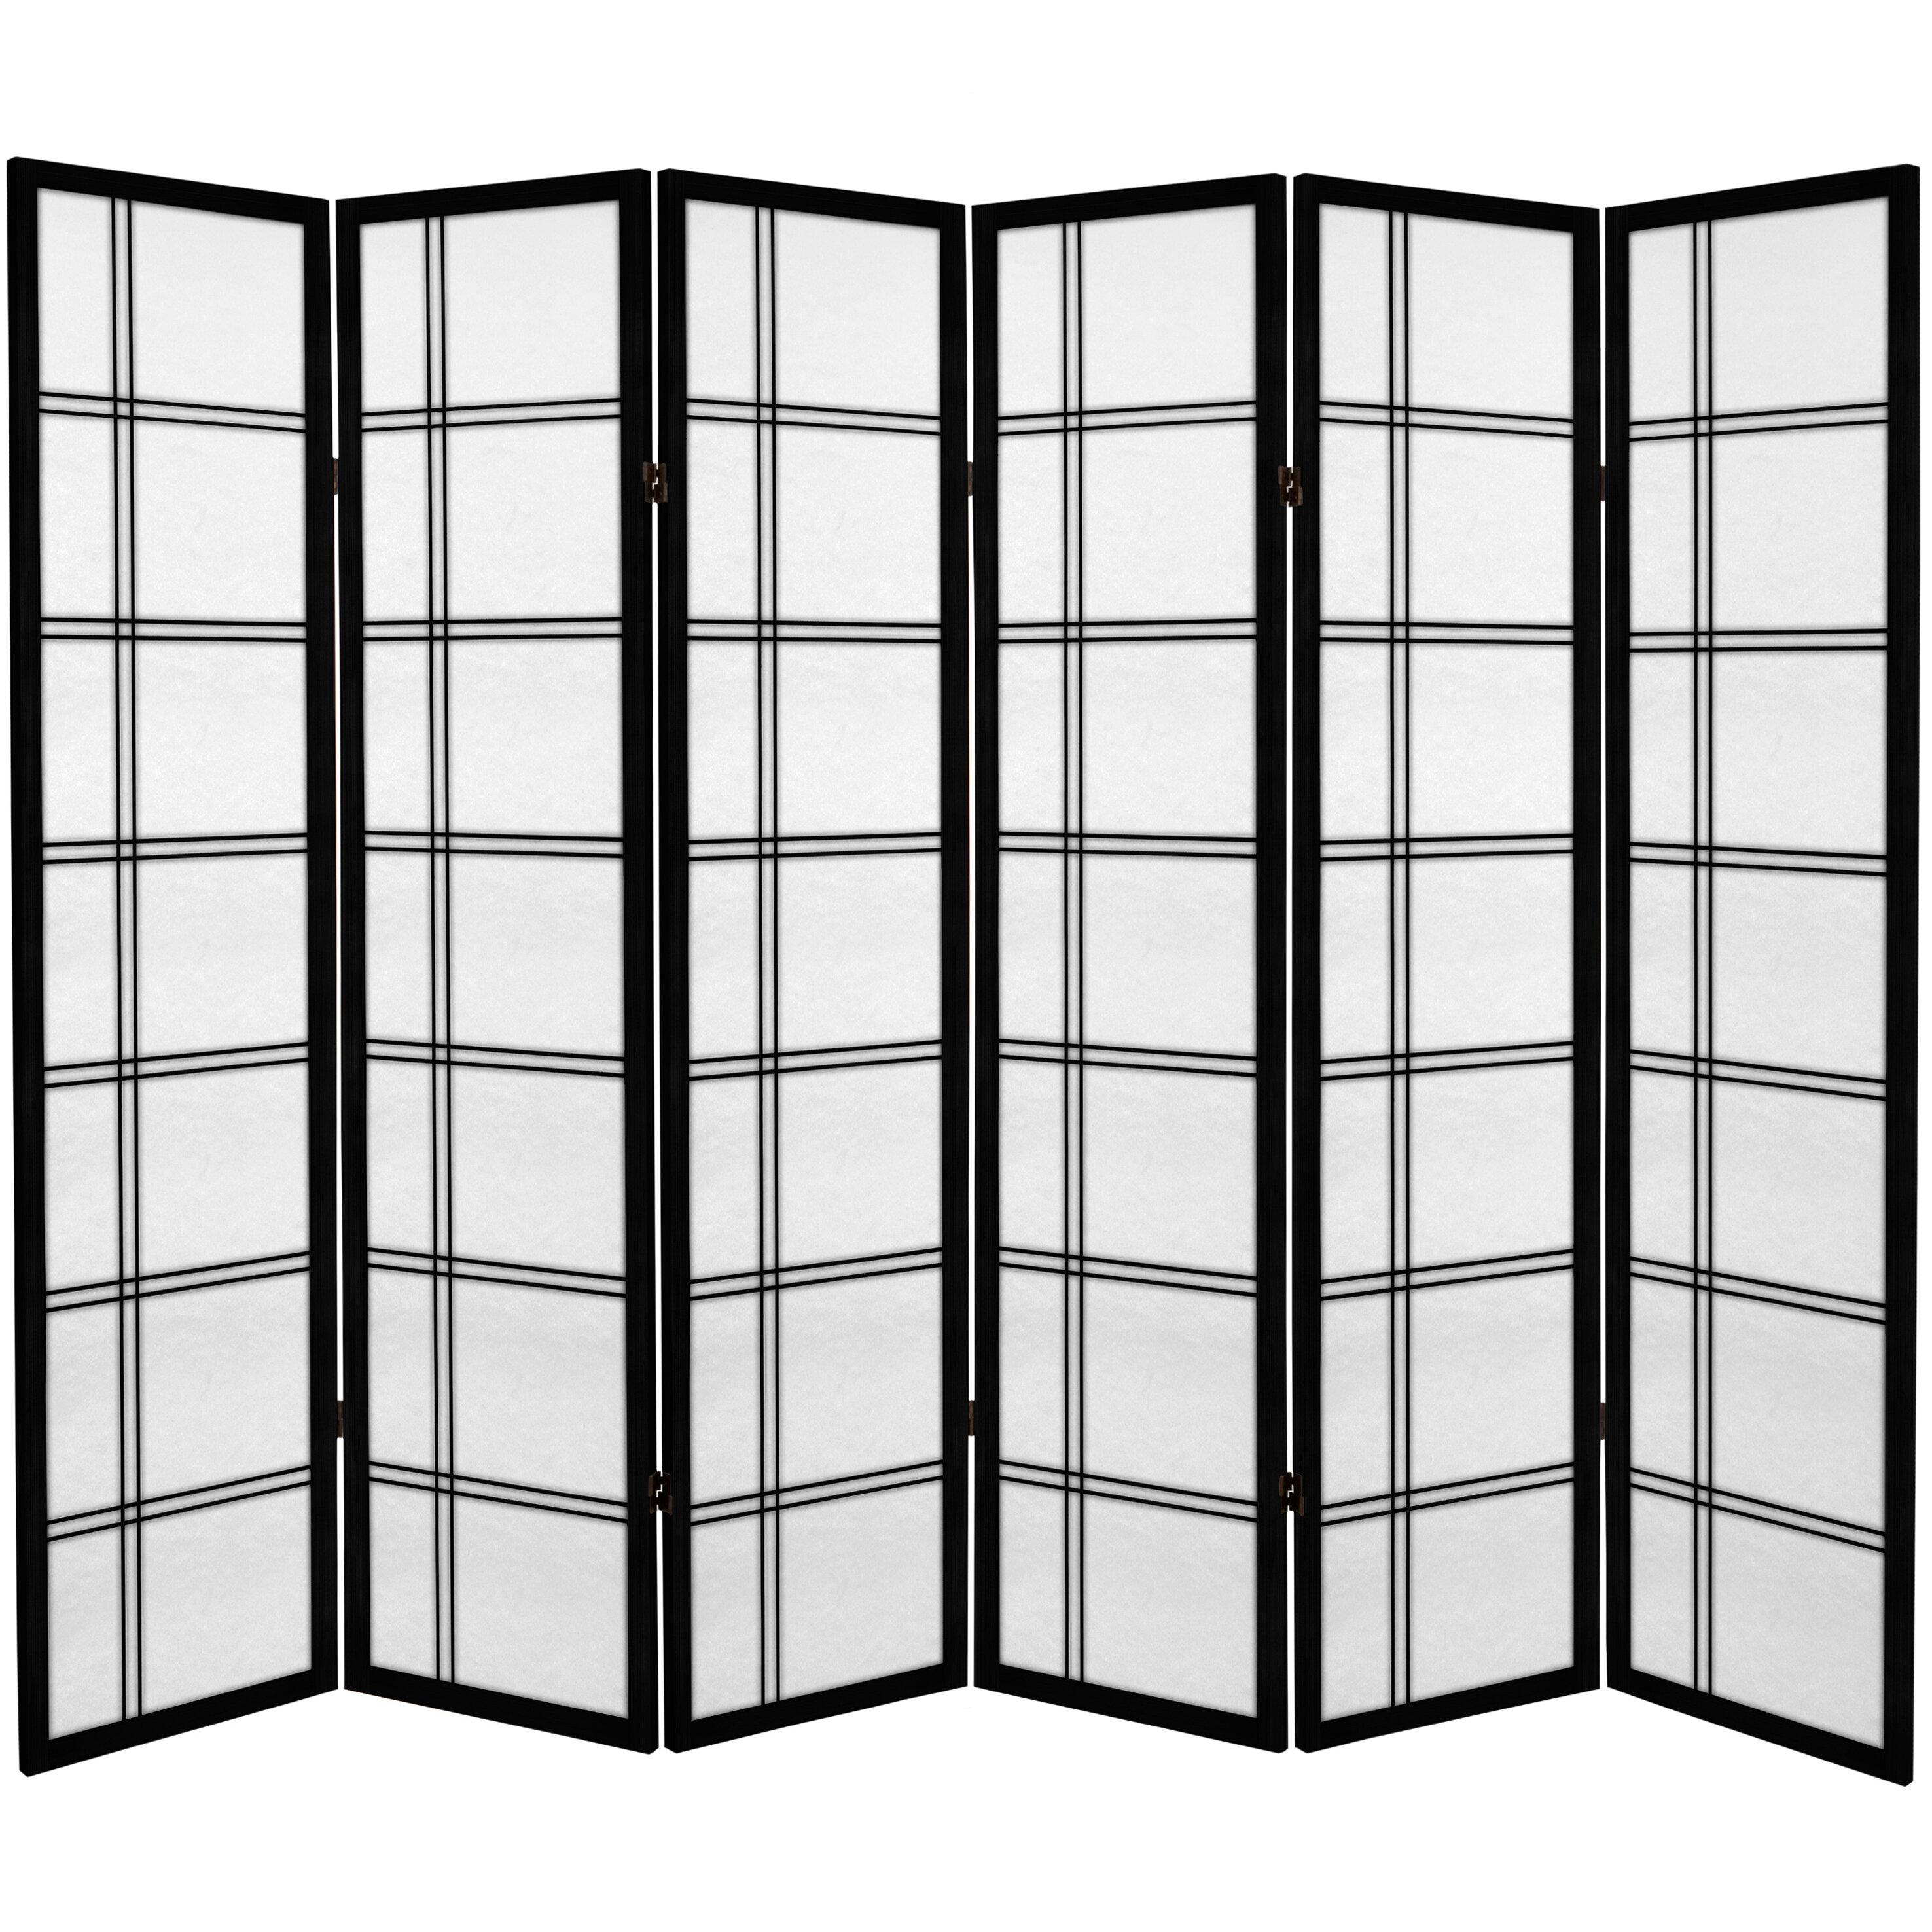 Bloomsbury Market Sandell 6 Panel Room Divider Reviews Wayfair